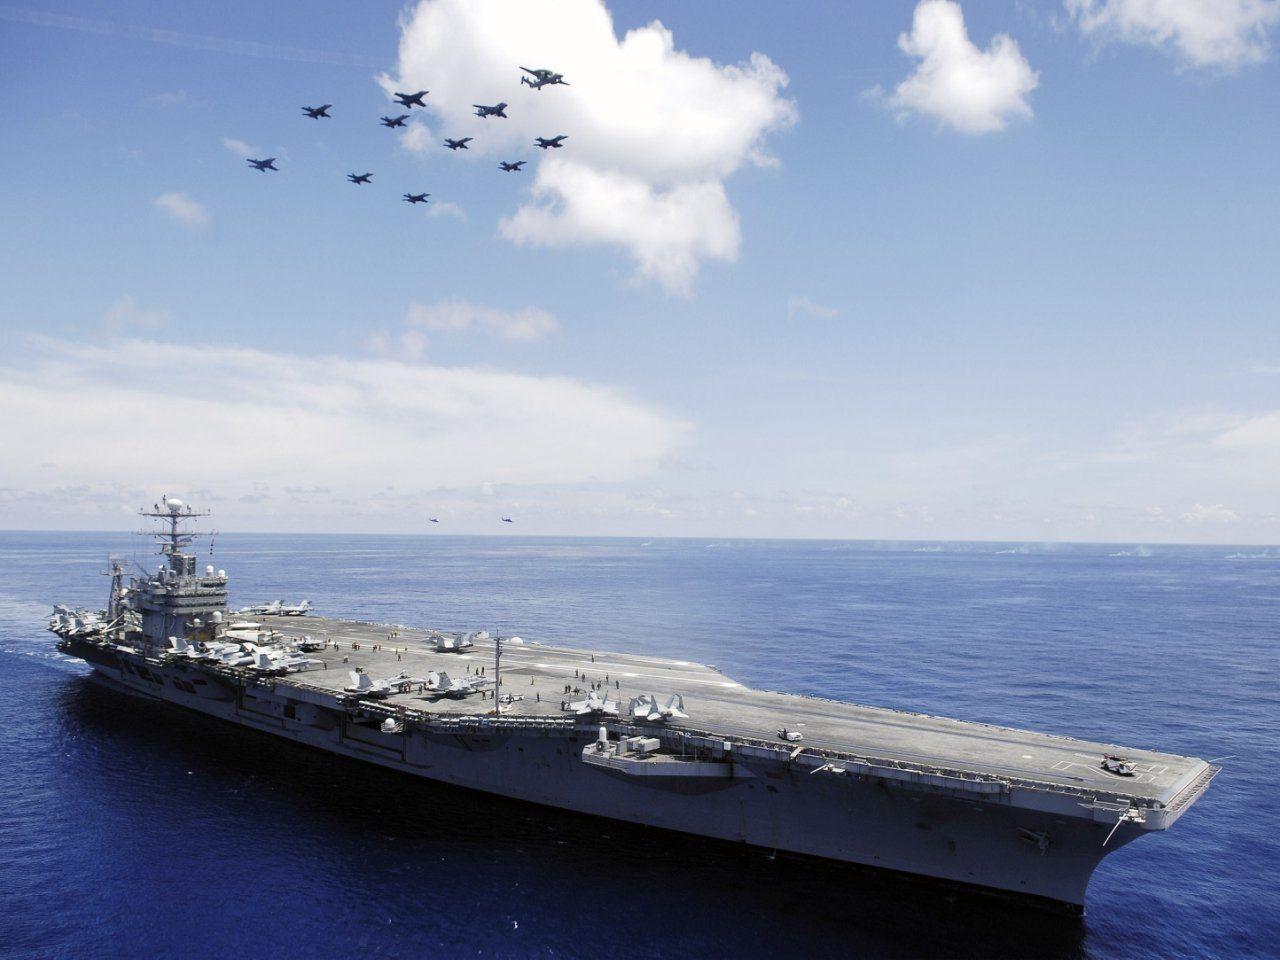 USS Nimitz Wallpapers - Wallpaper Cave